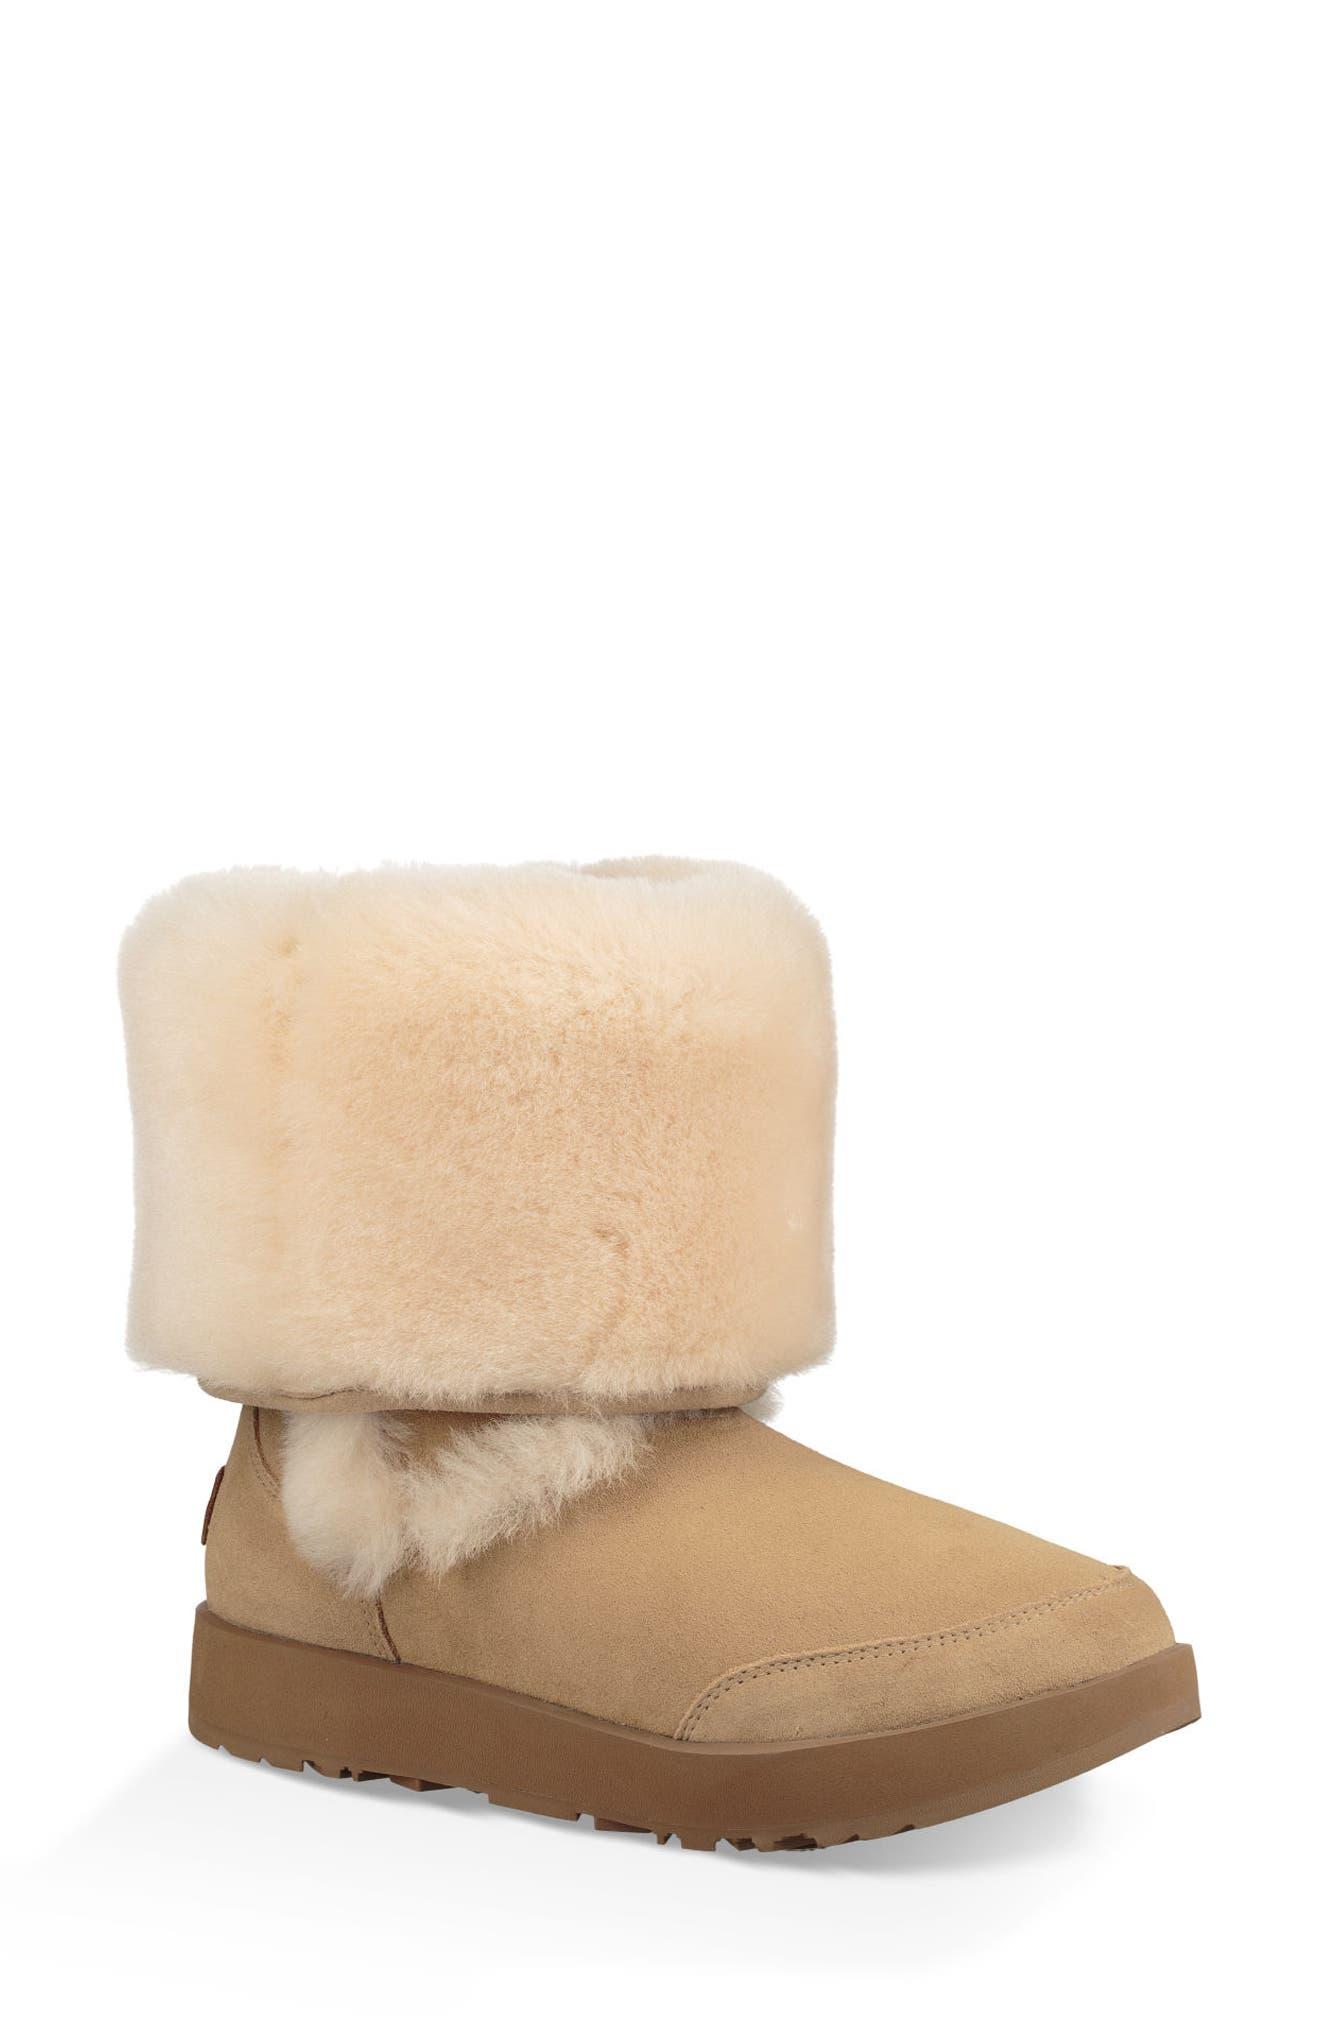 Sundance Genuine Shearling Waterproof Boot,                             Alternate thumbnail 8, color,                             251